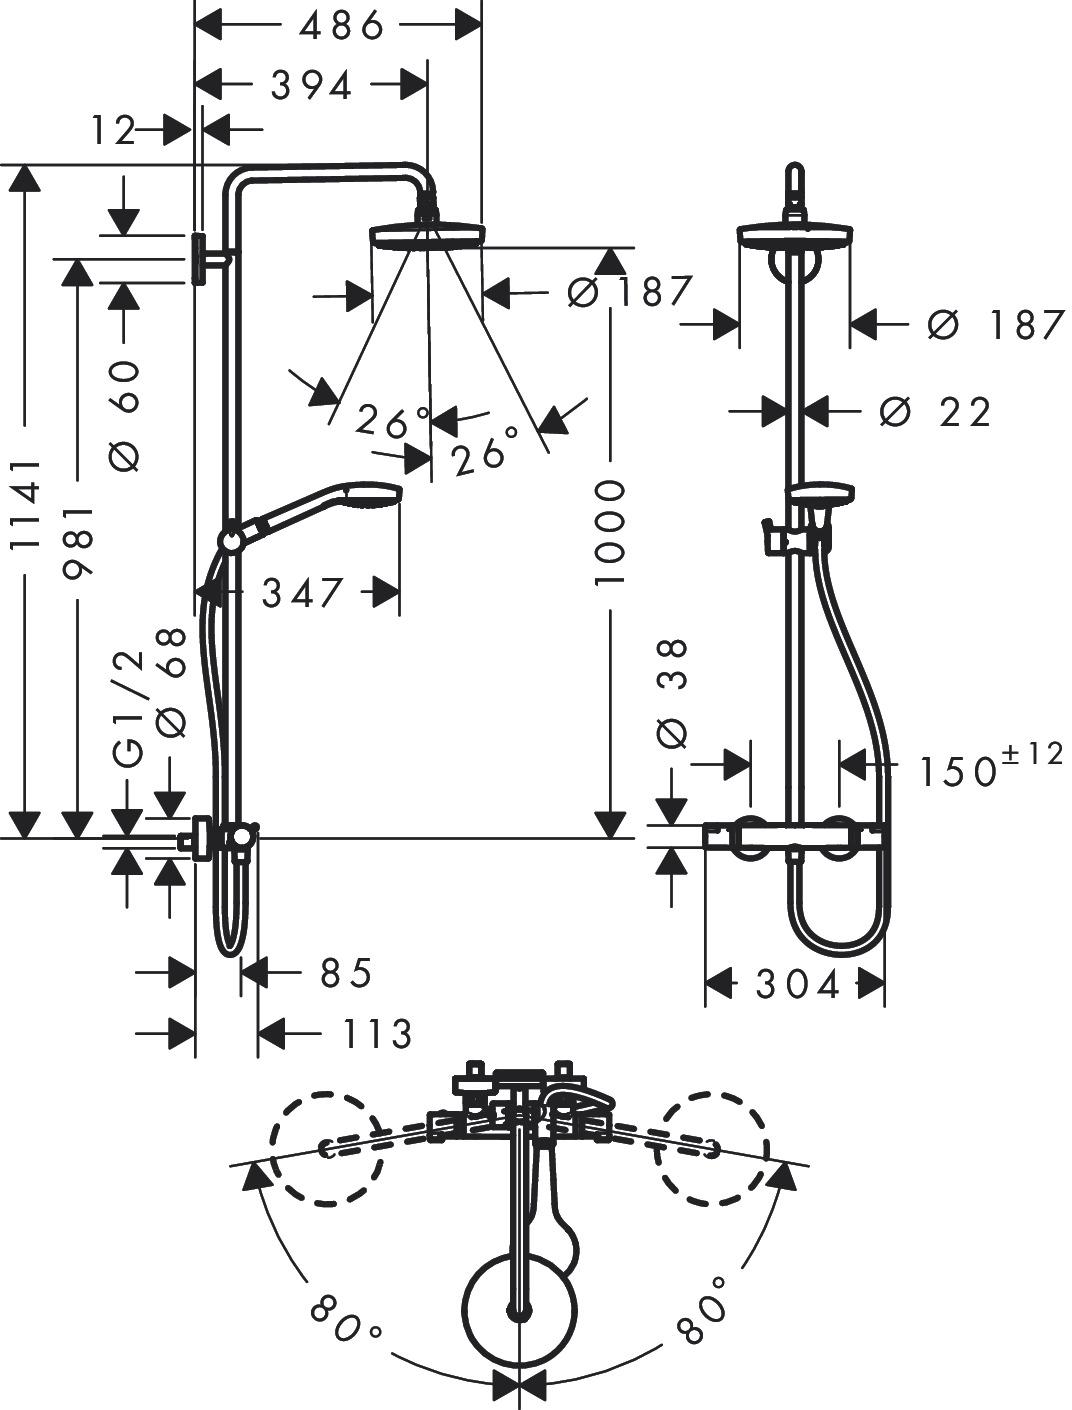 hansgrohe showerpipes croma select s 2 strahlarten art nr 27253400 hansgrohe de. Black Bedroom Furniture Sets. Home Design Ideas